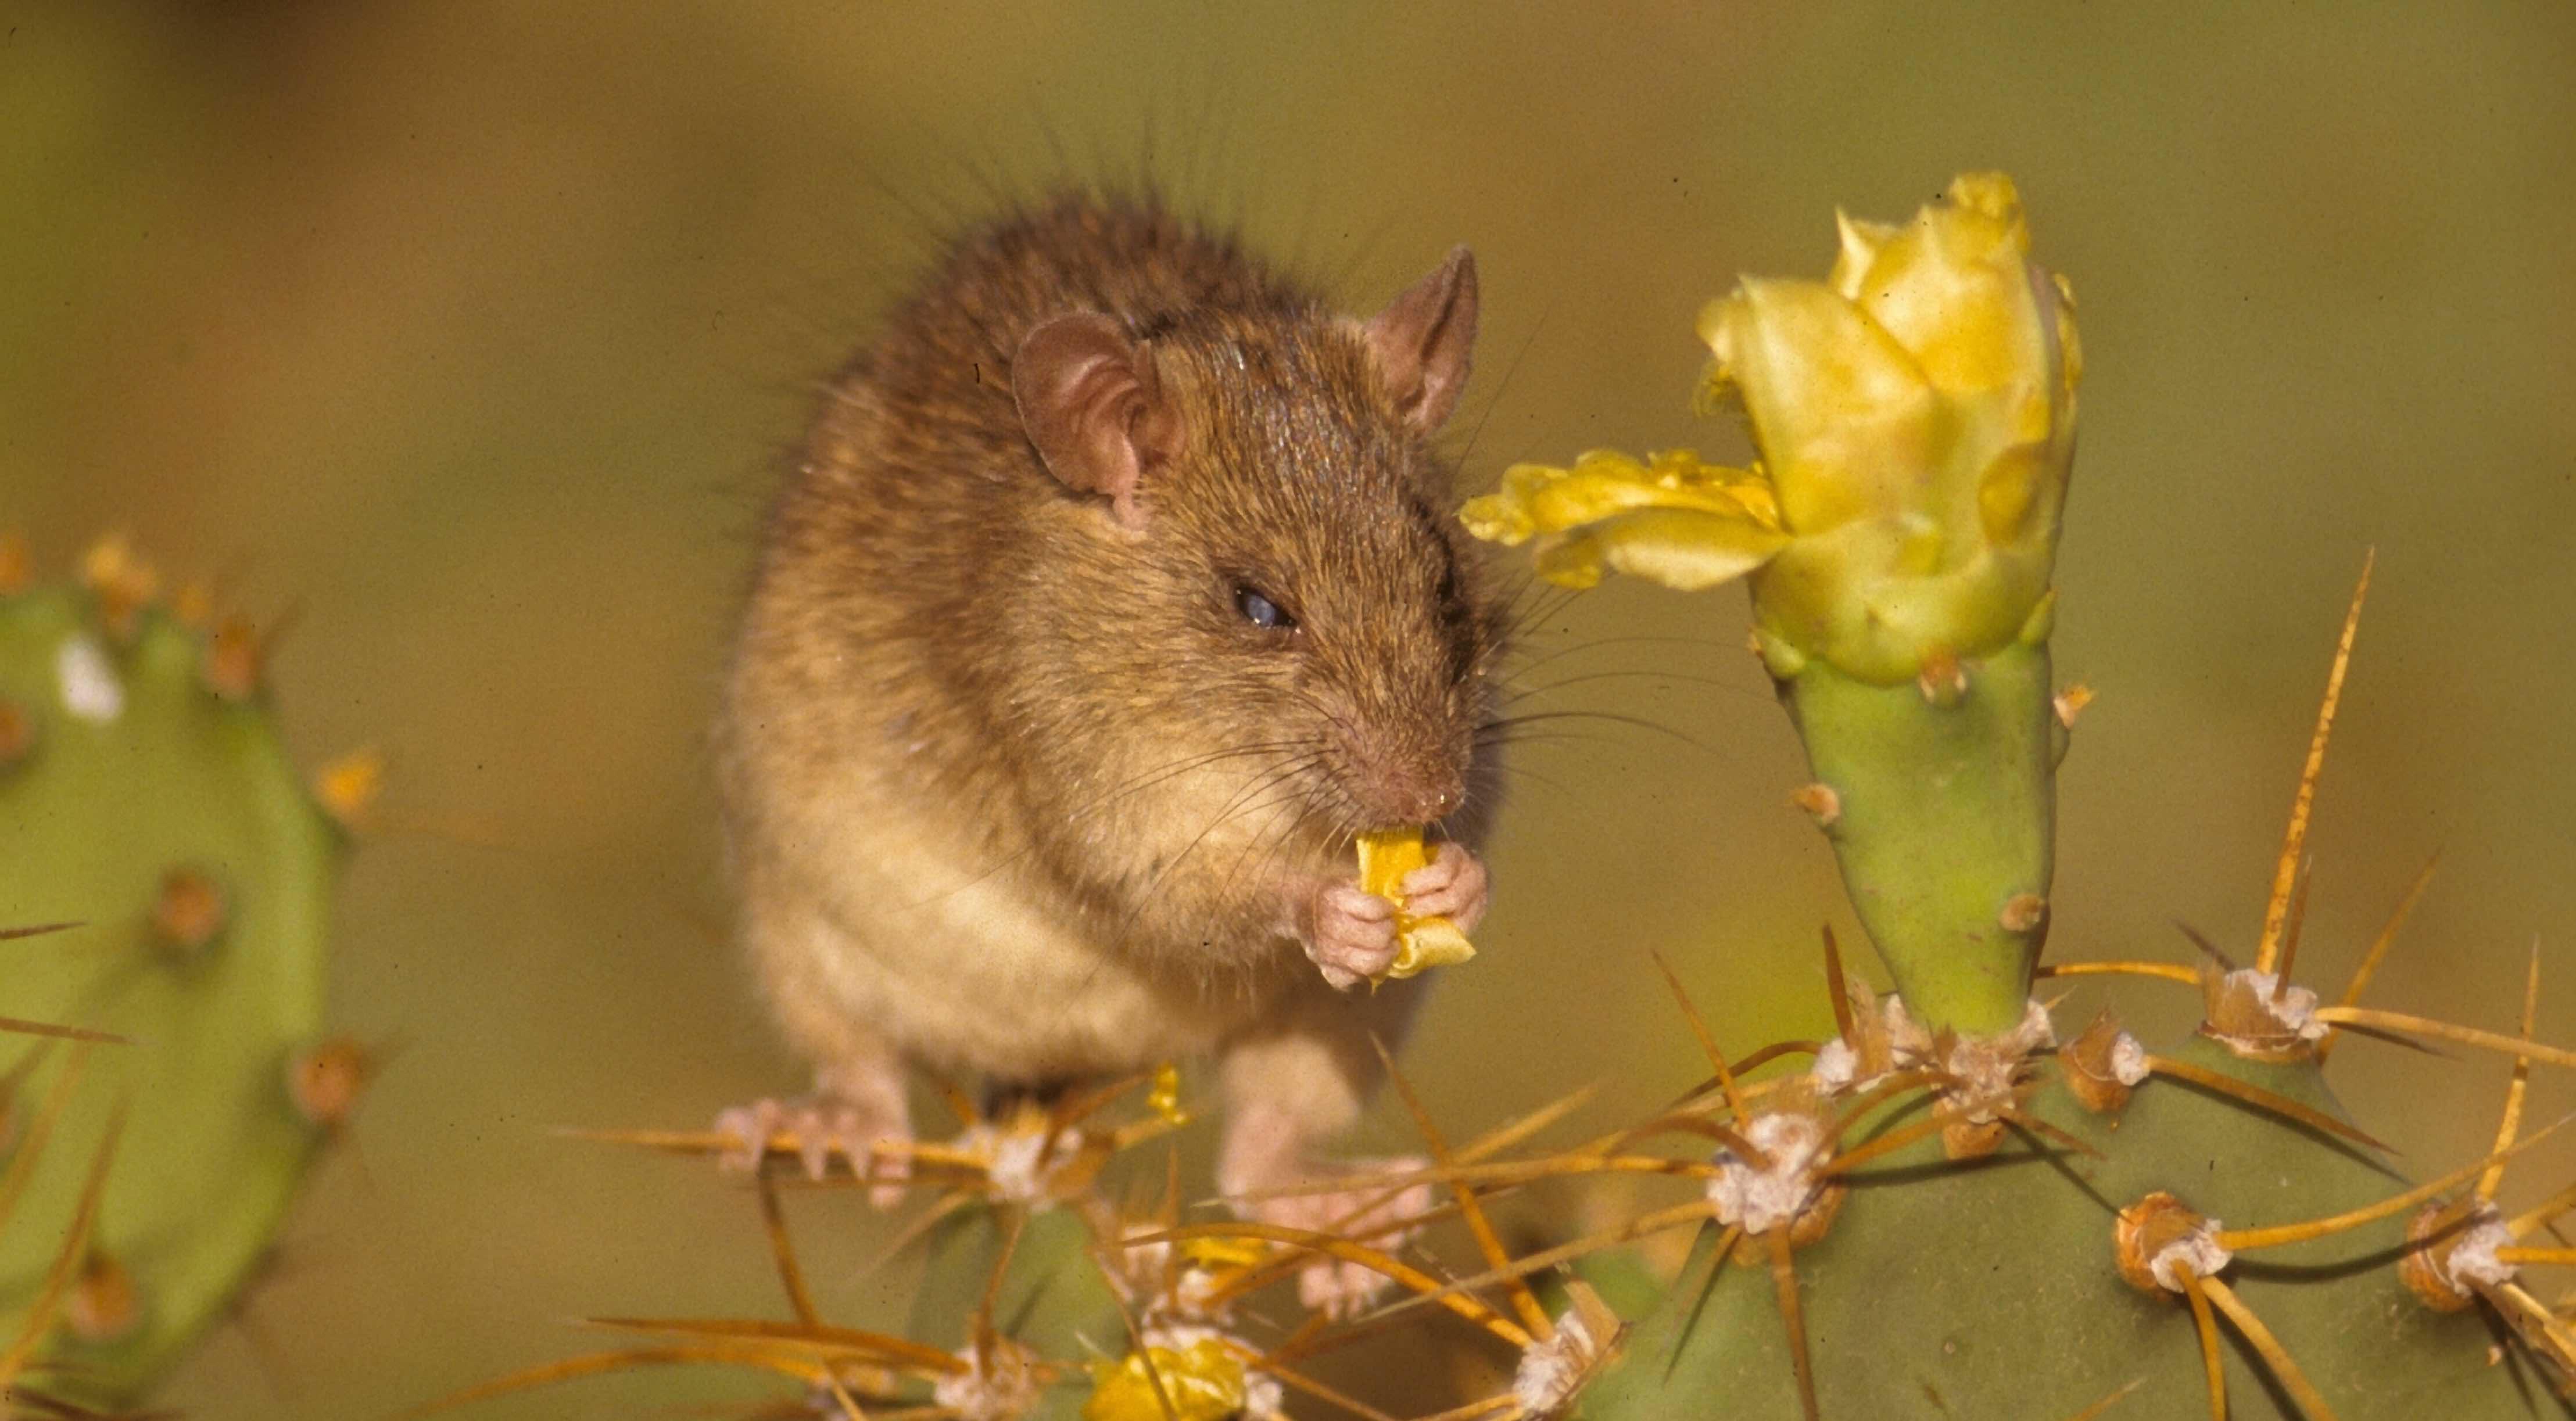 Redonda is home to around 5,000 invasive black rats. Photo by John Cancalosi/Fauna & Flora International.